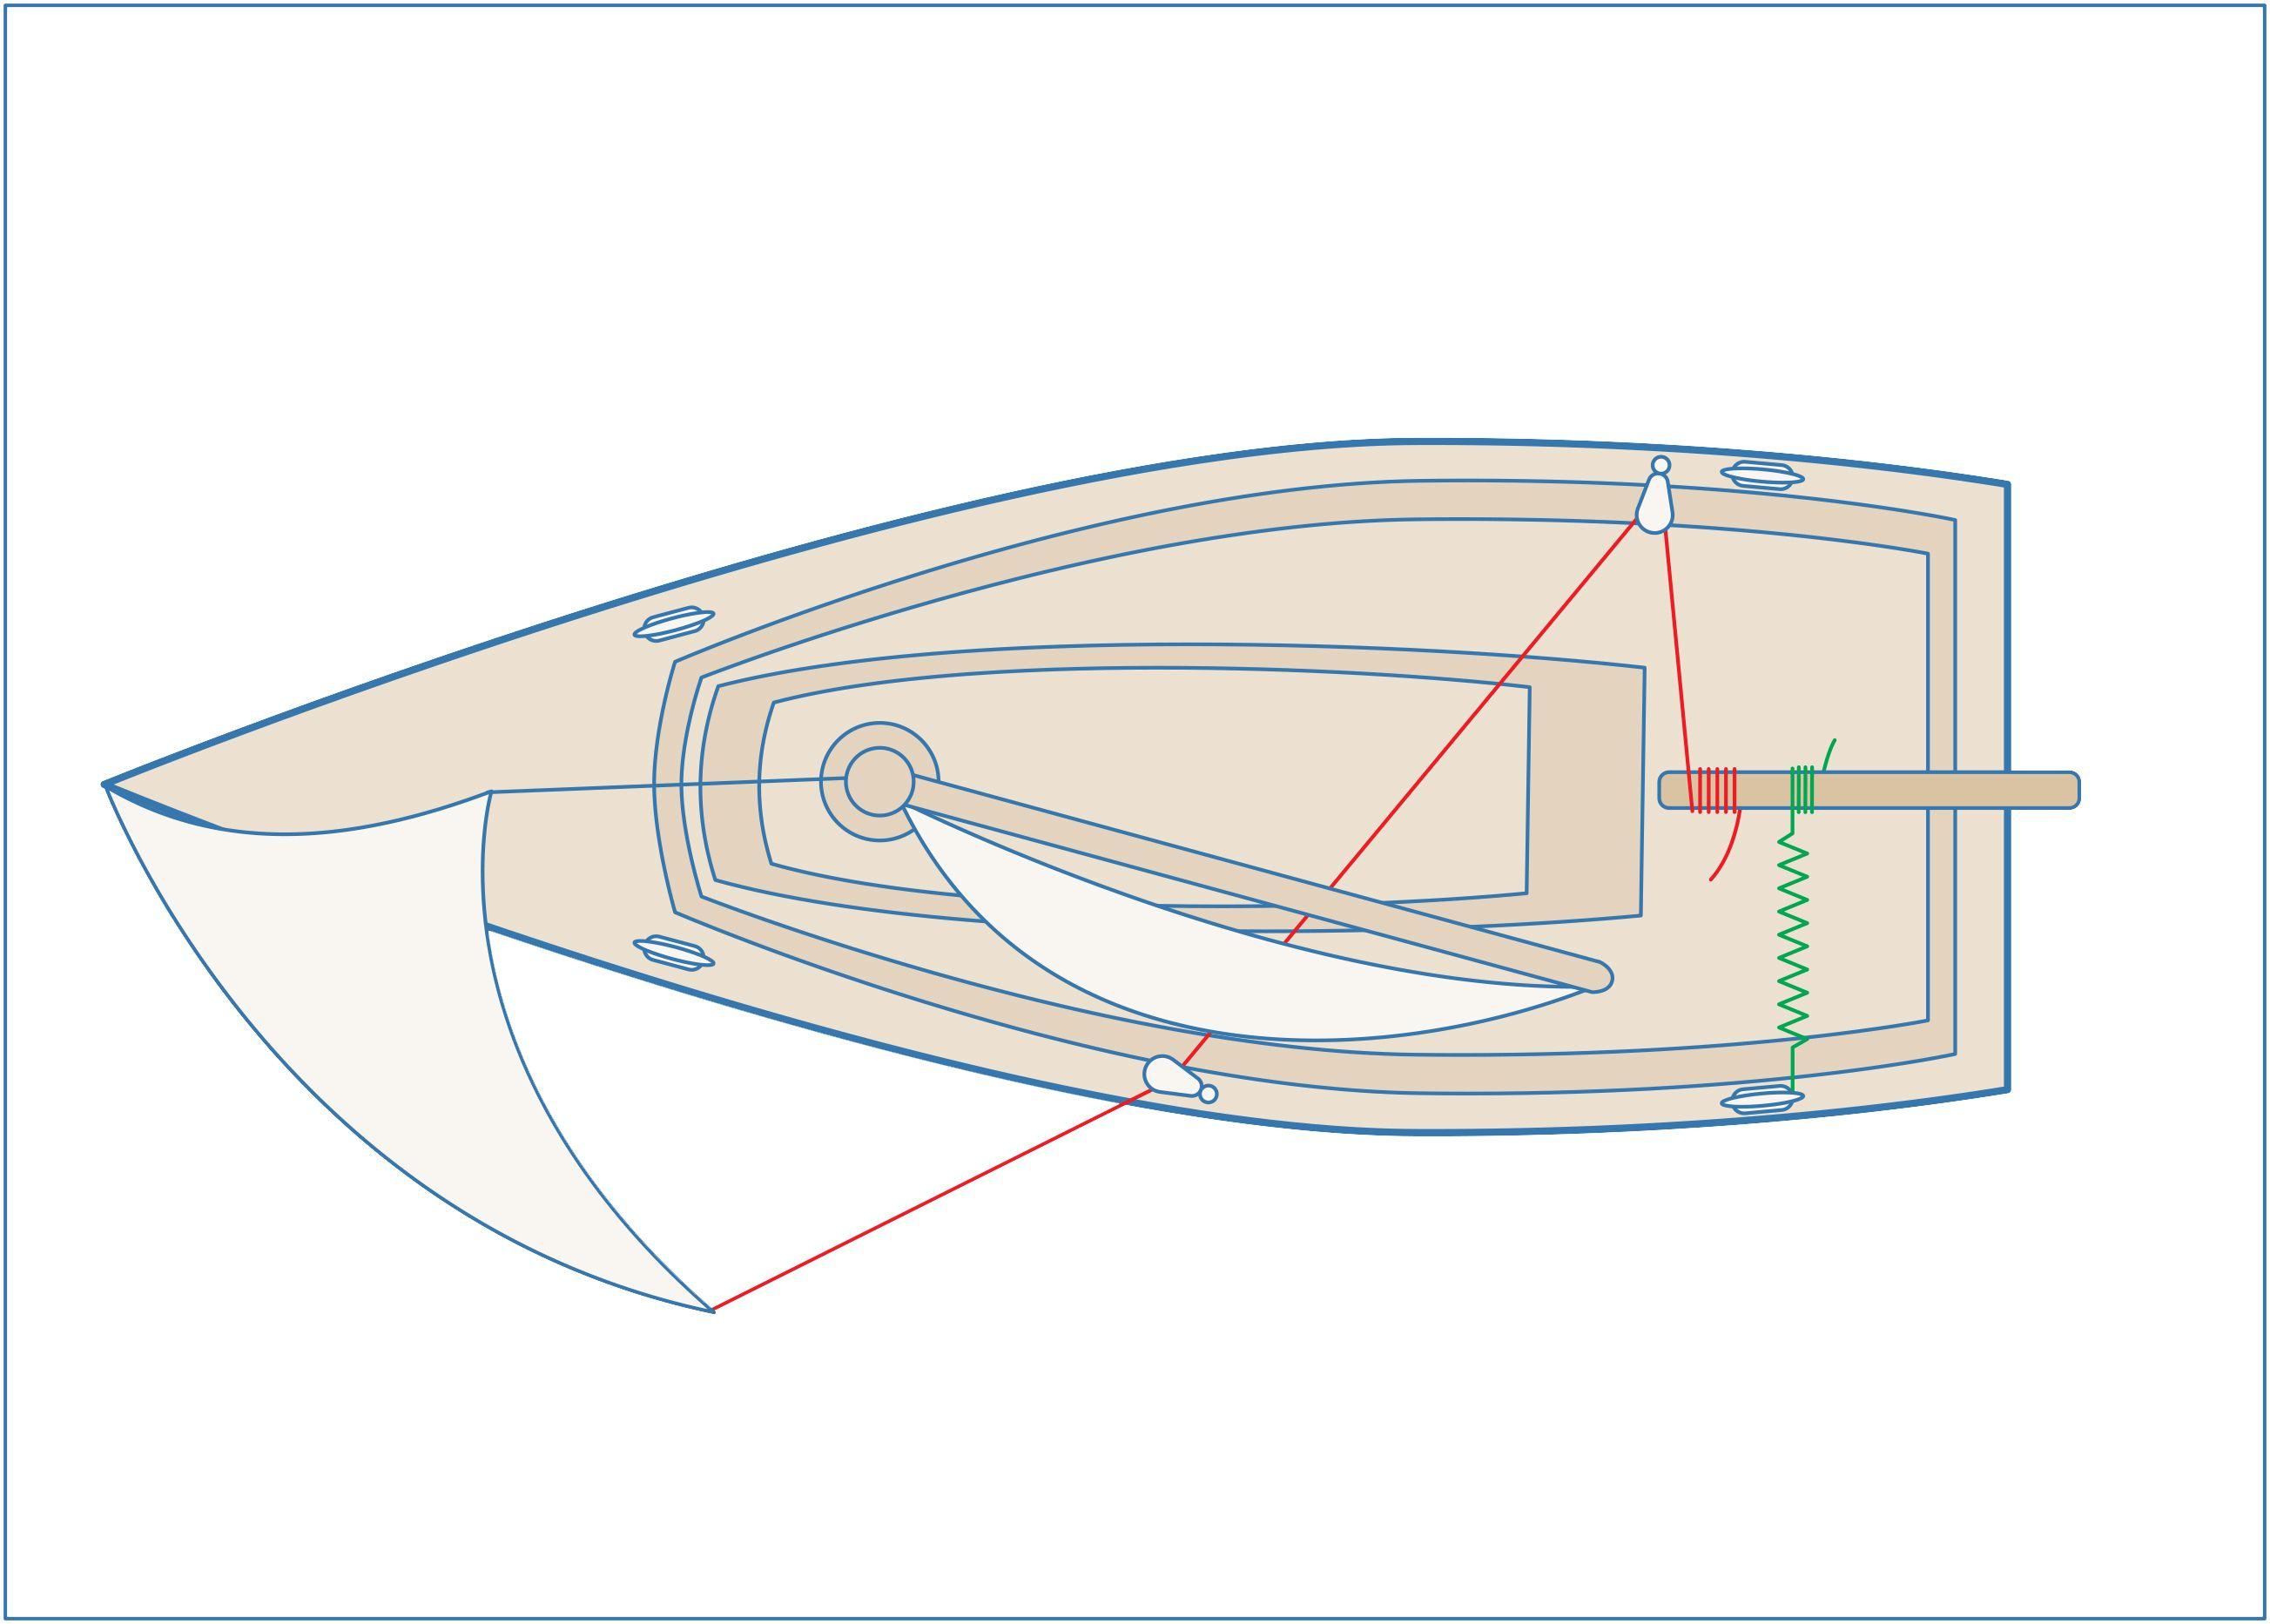 Sailboat Deck Gear Diagram - Wiring Diagrams Folder on